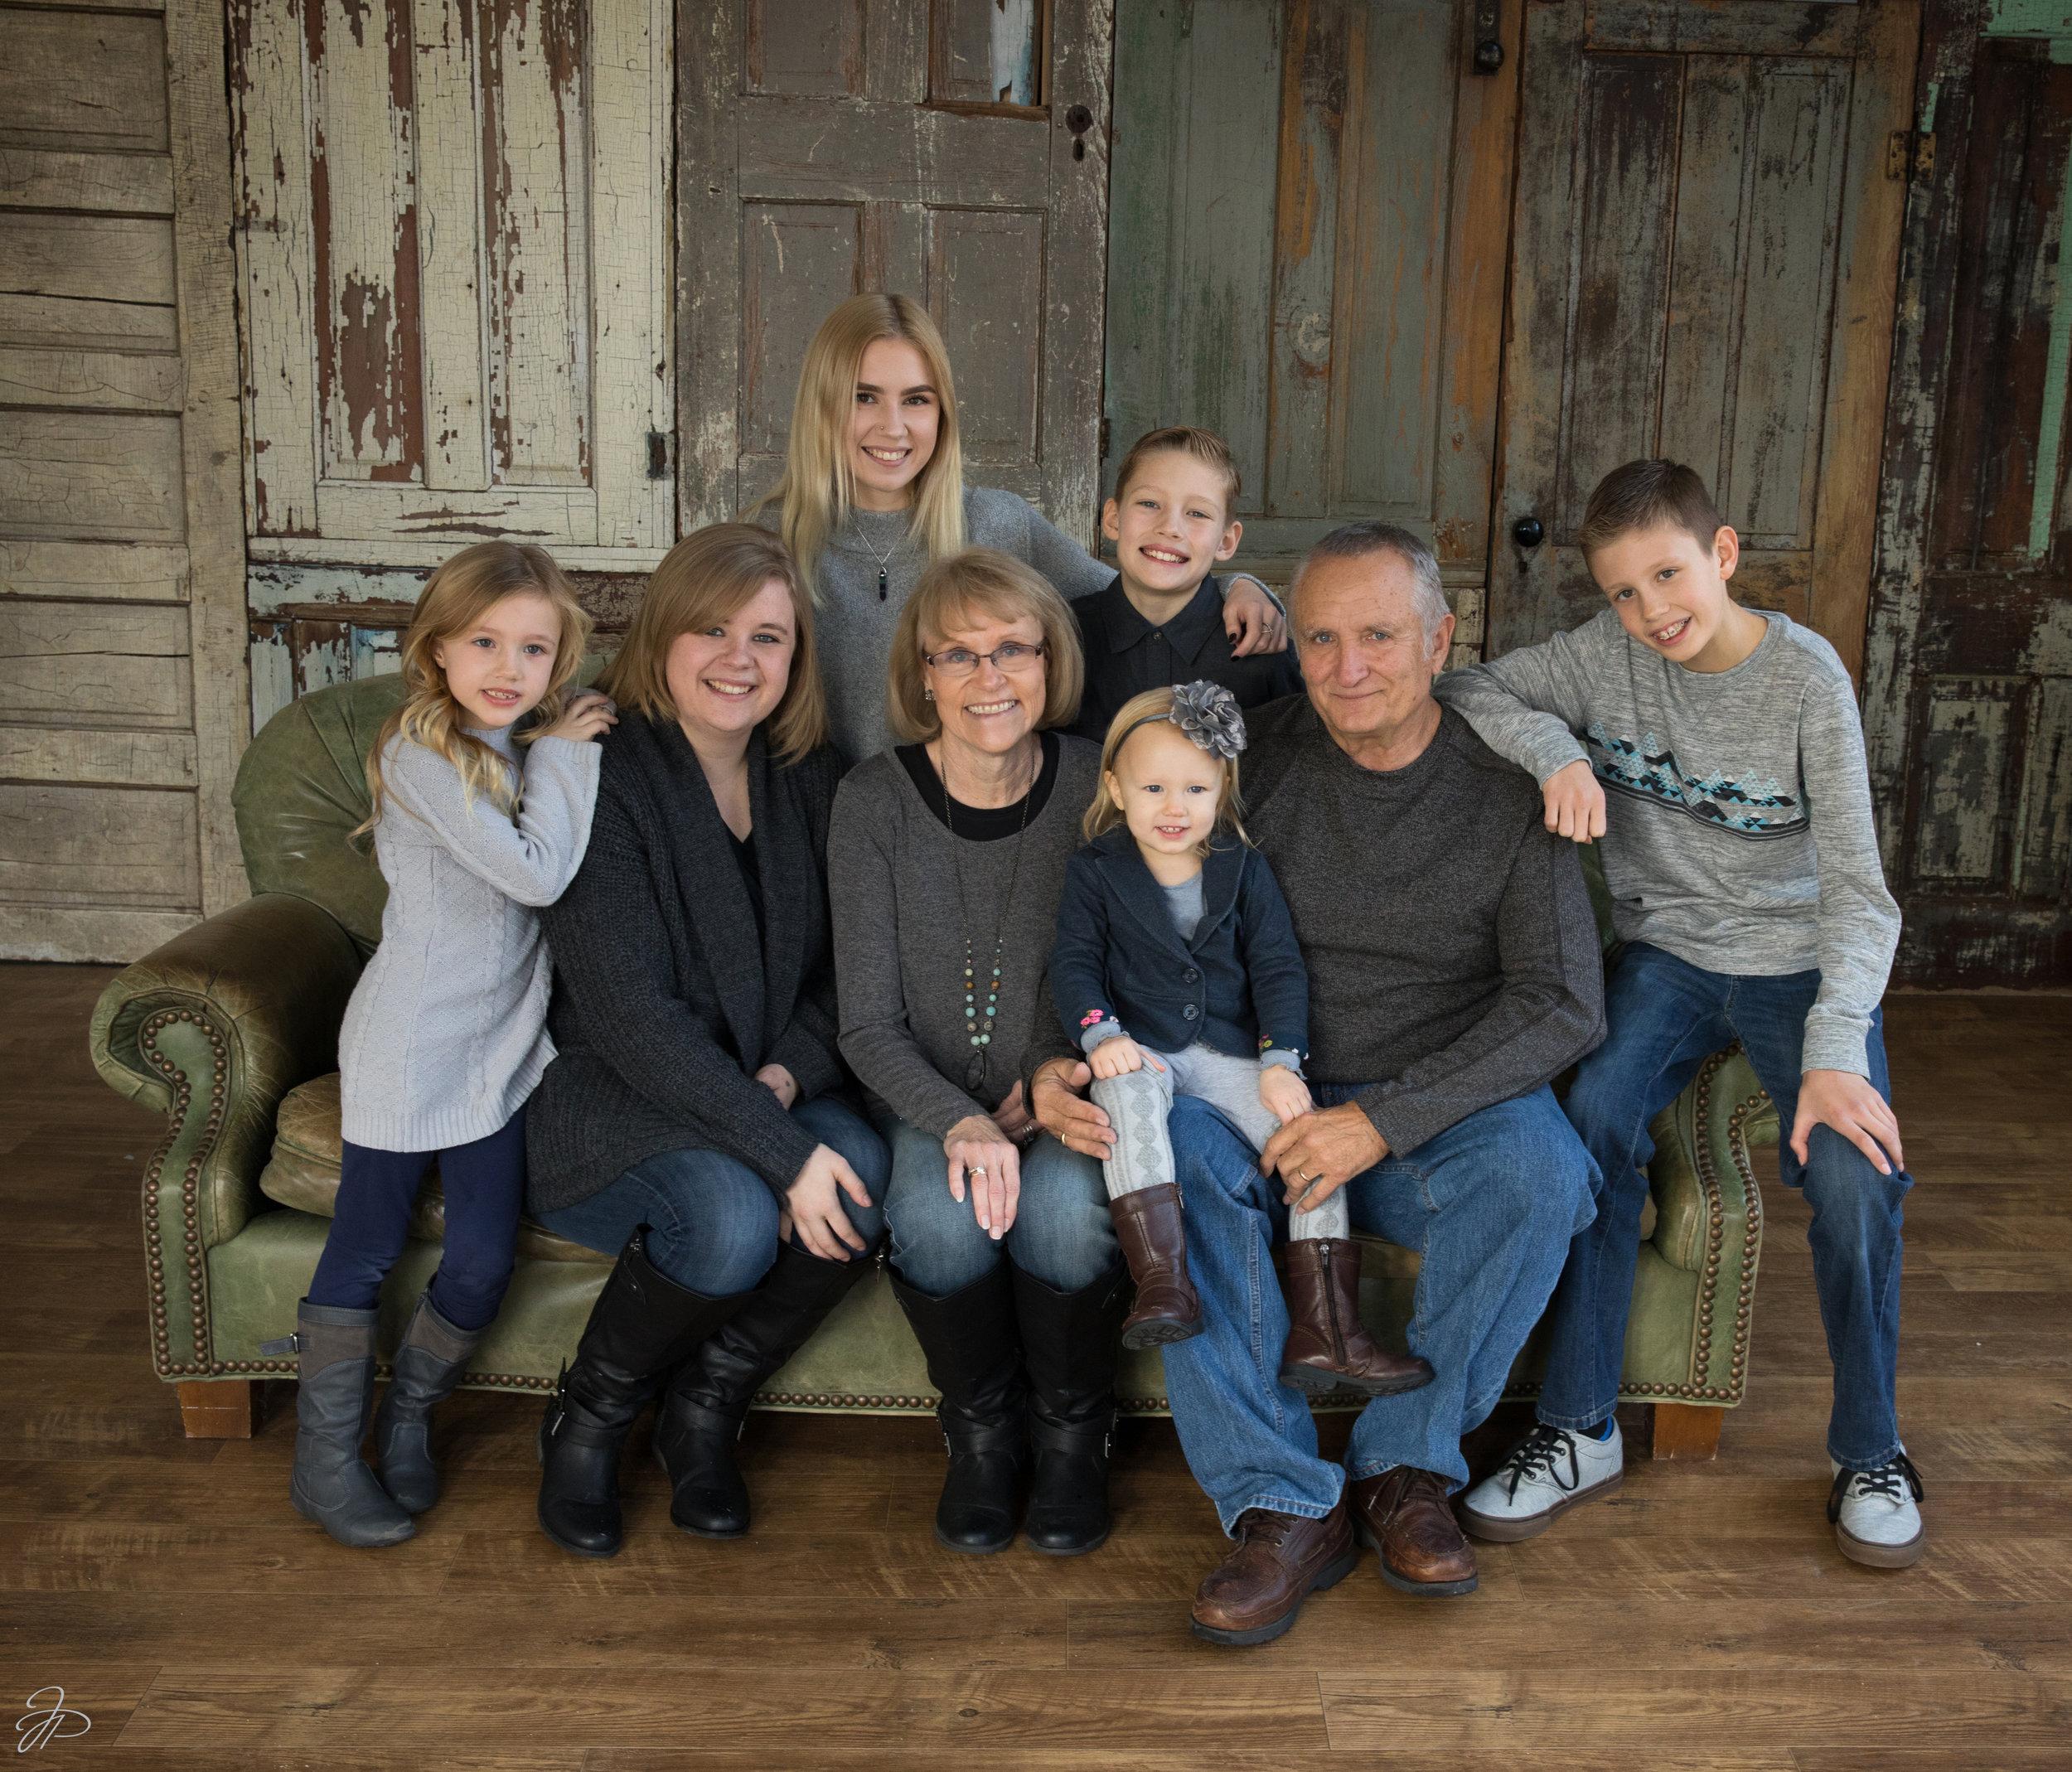 Bob & Cathy with their grandchildren.